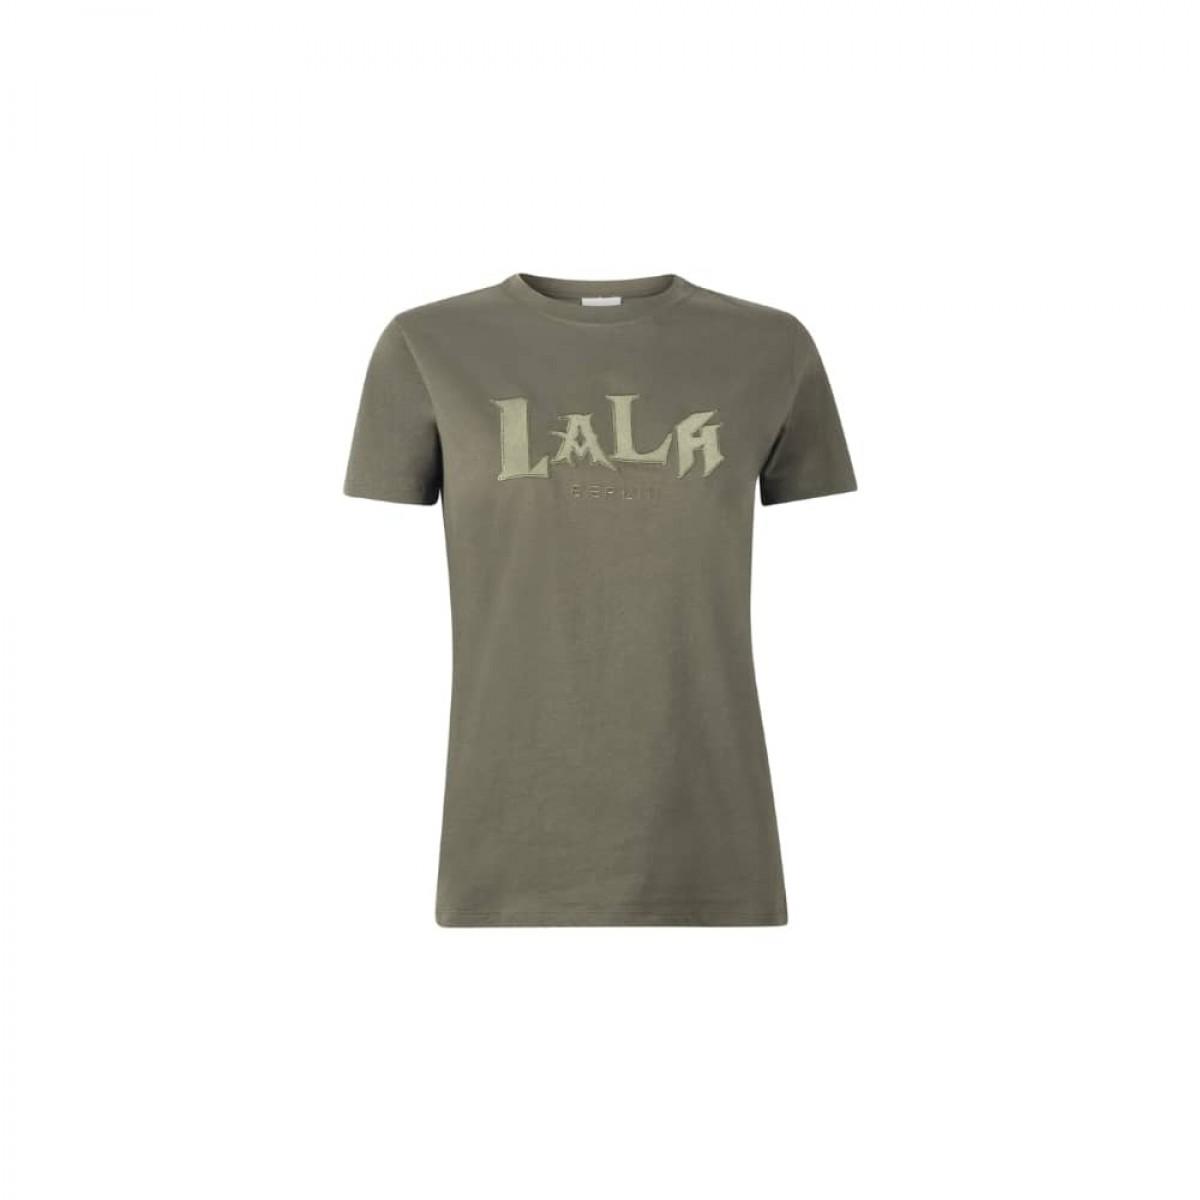 t-shirt reda lala mix - olive night - front